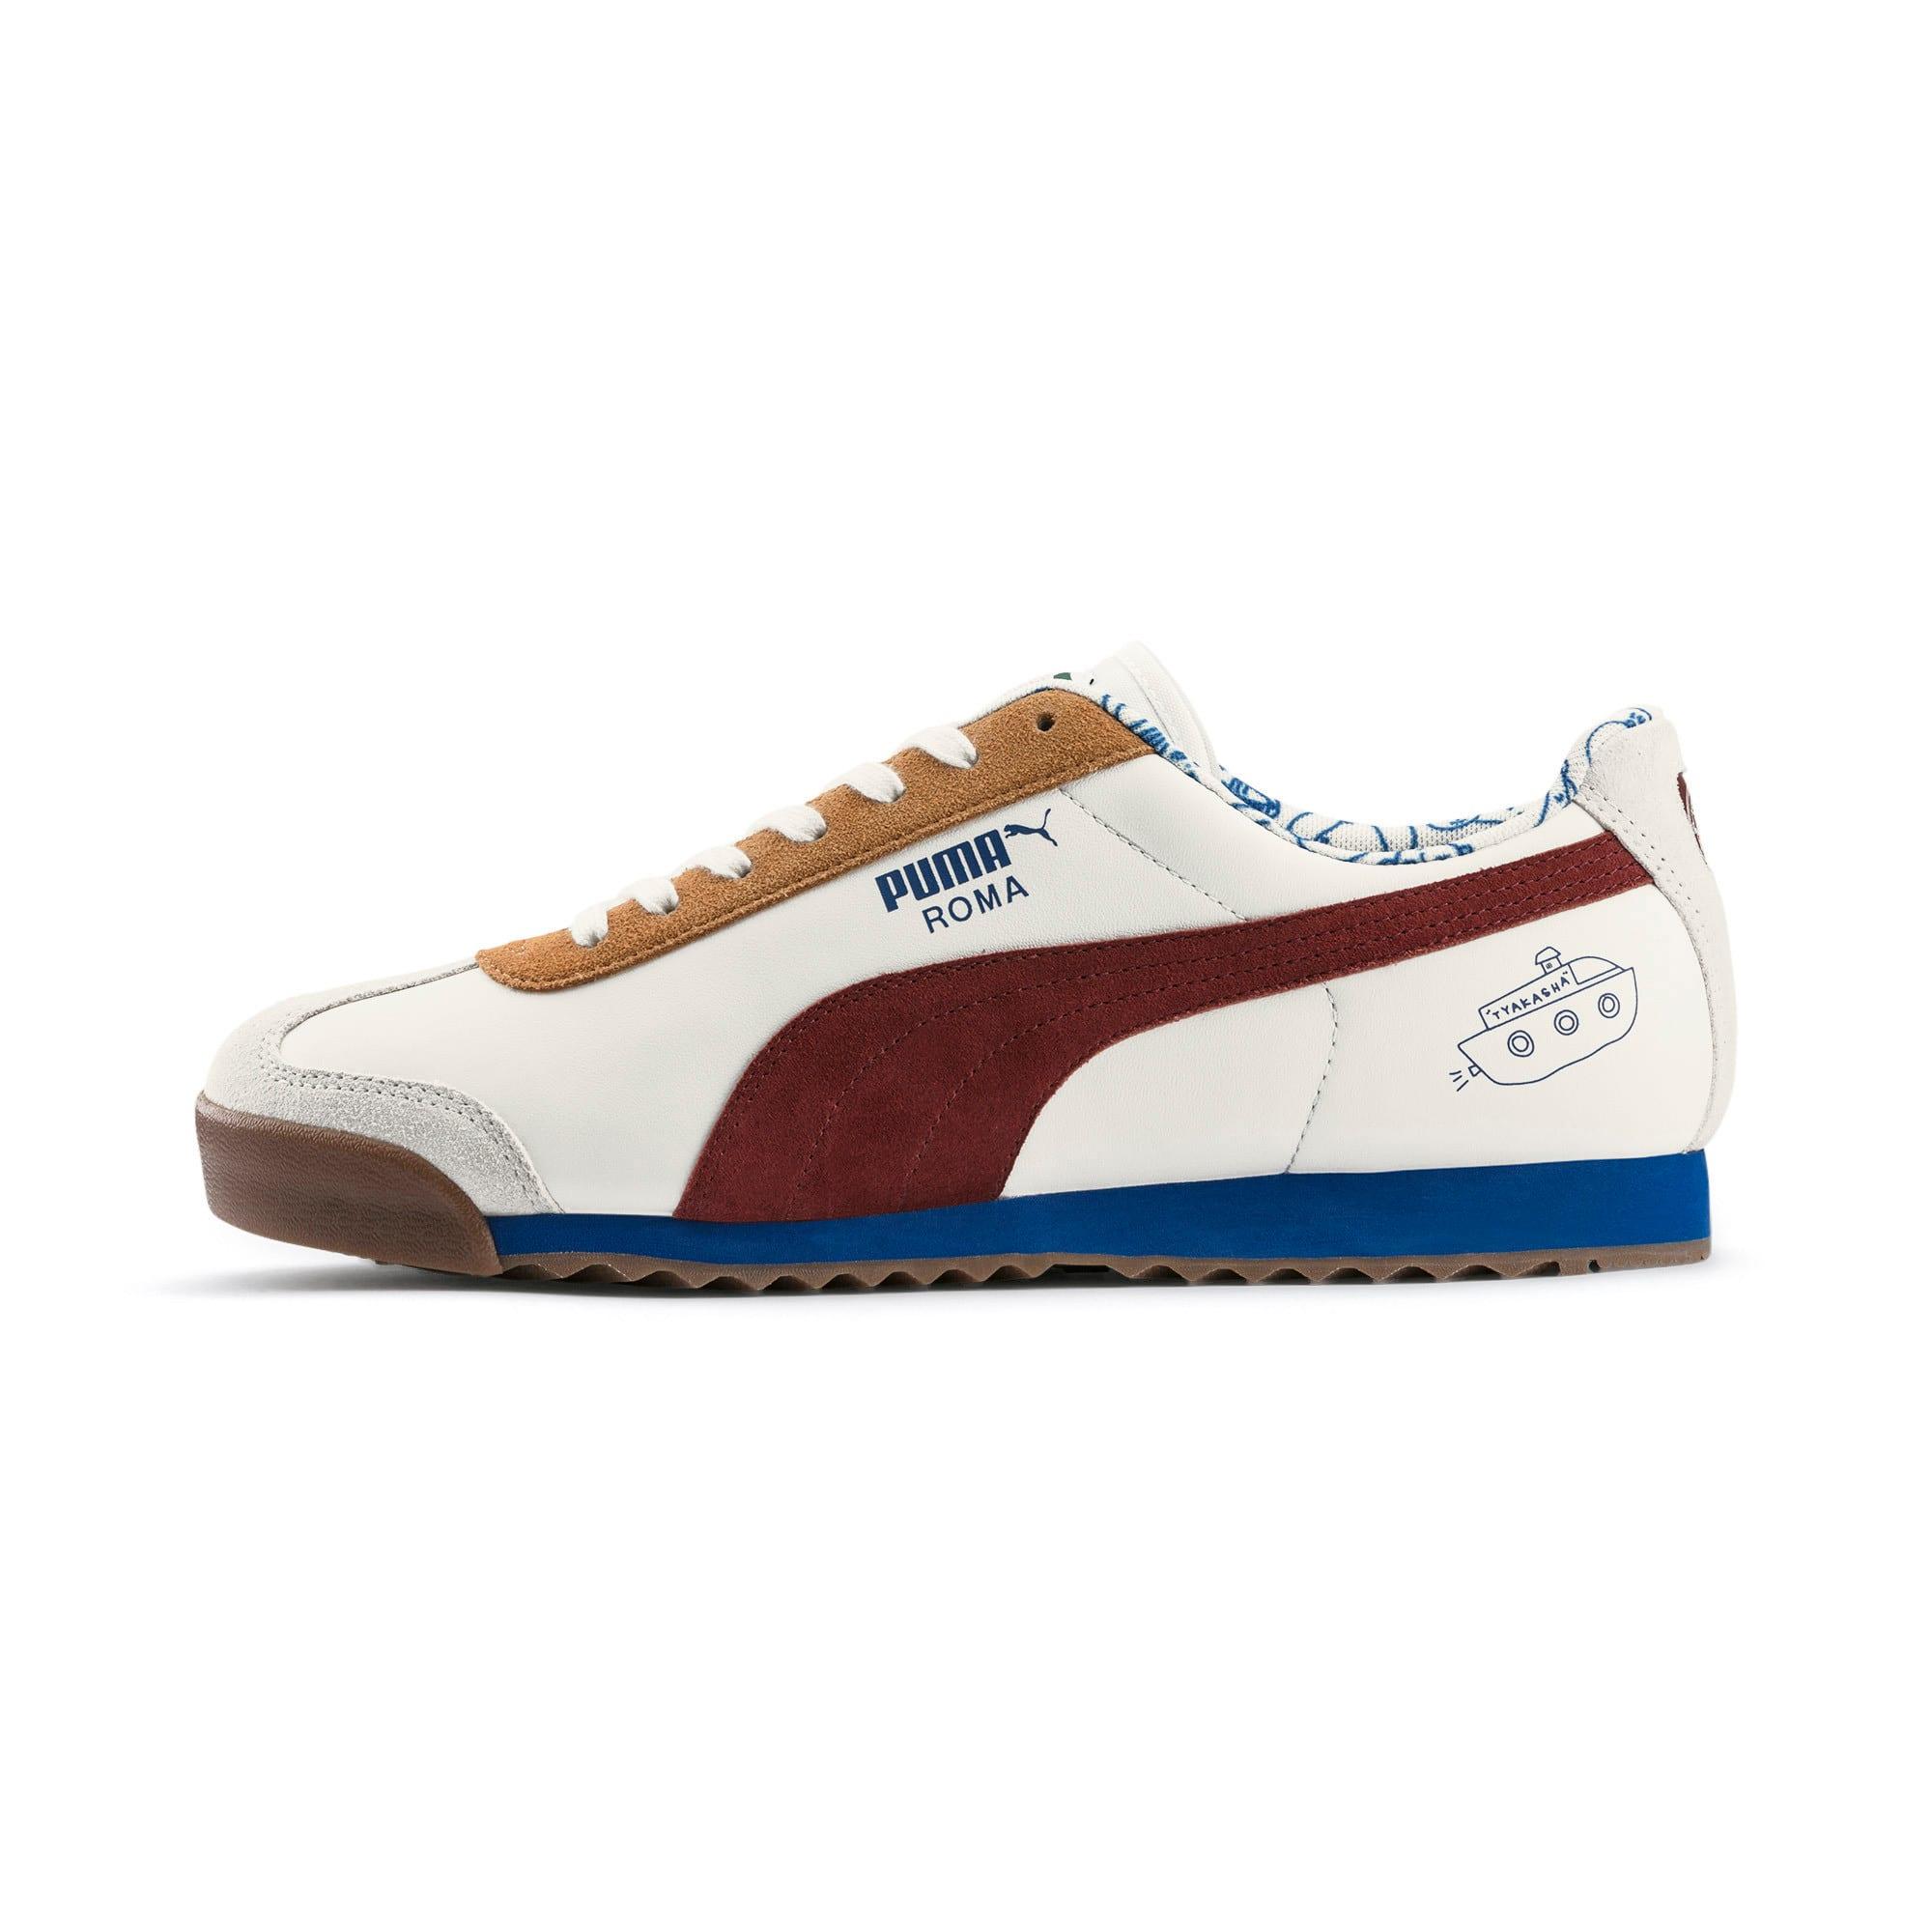 Thumbnail 1 of PUMA x TYAKASHA Roma Sneakers, Marshmallow-Fired Brick, medium